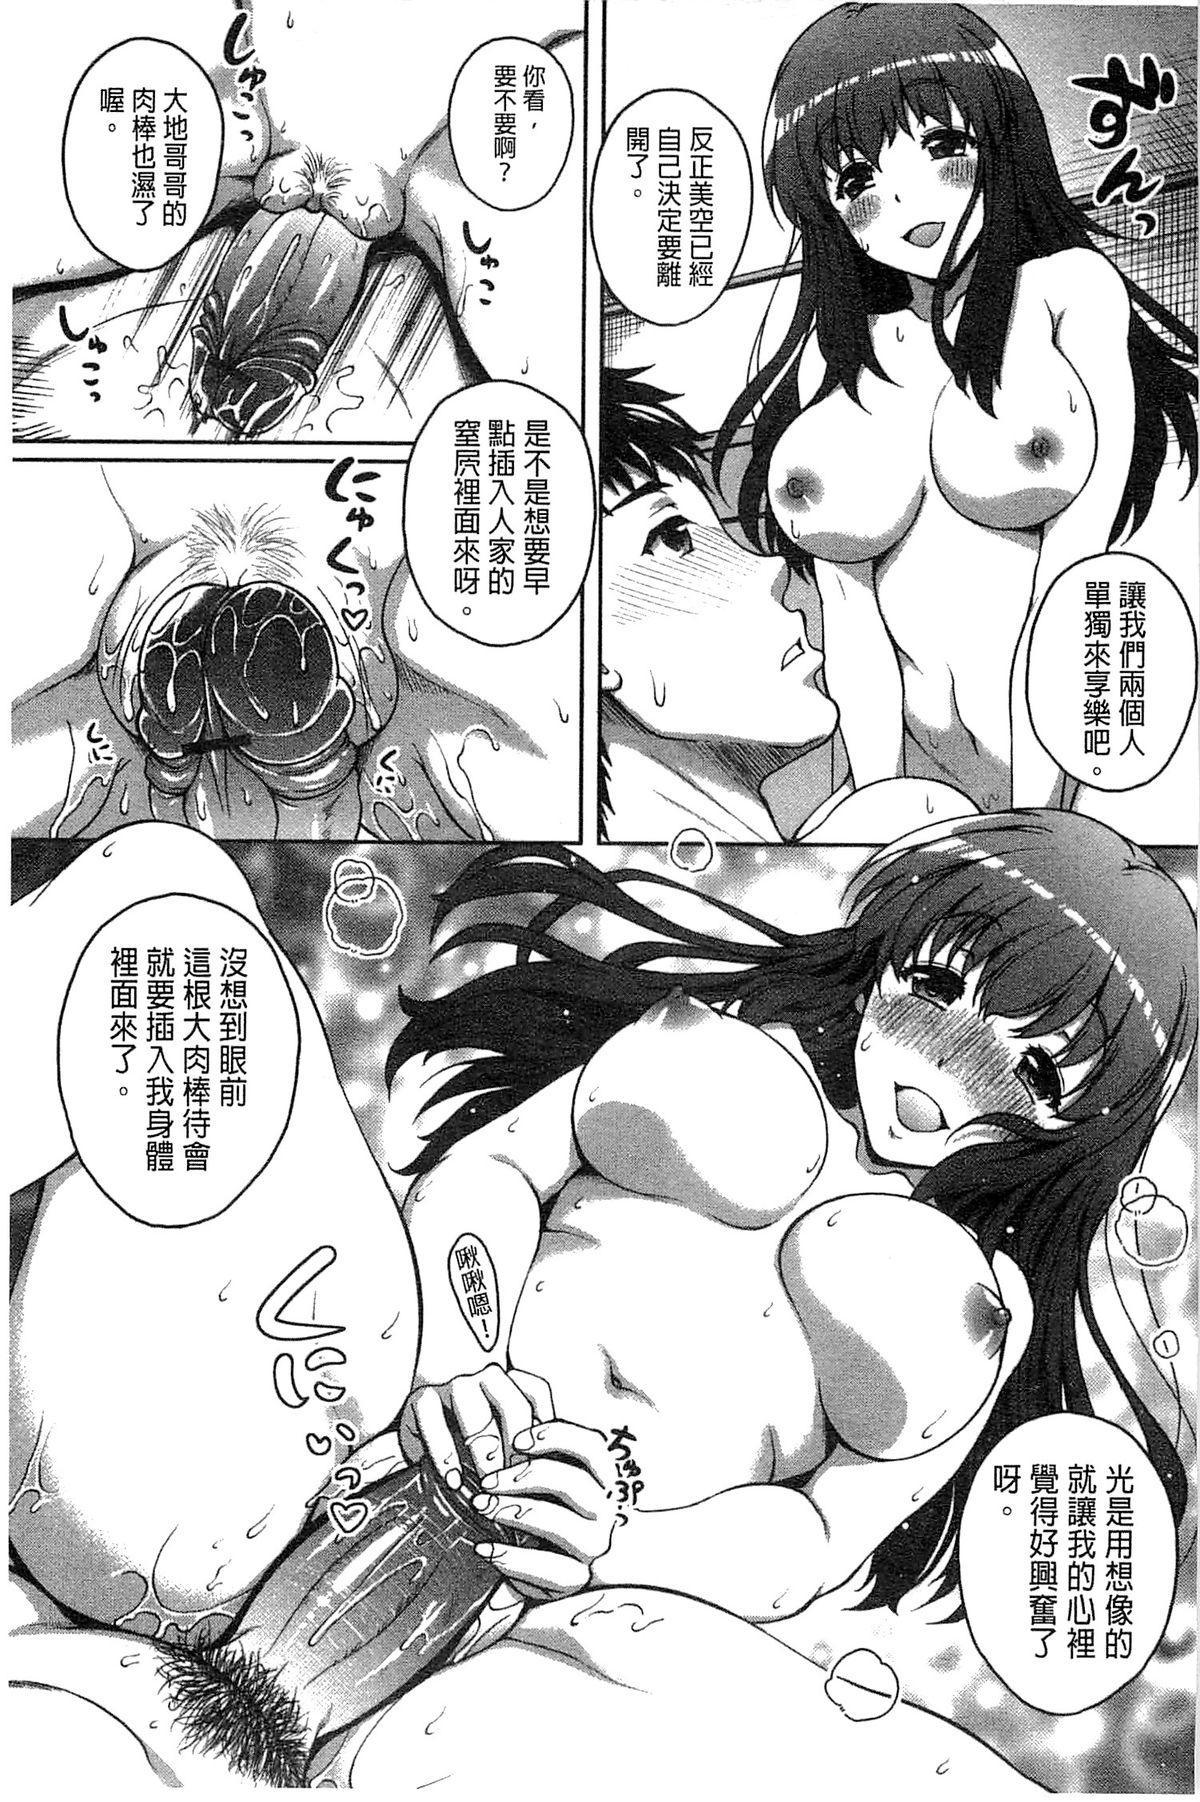 Hajimete nan da kara 139